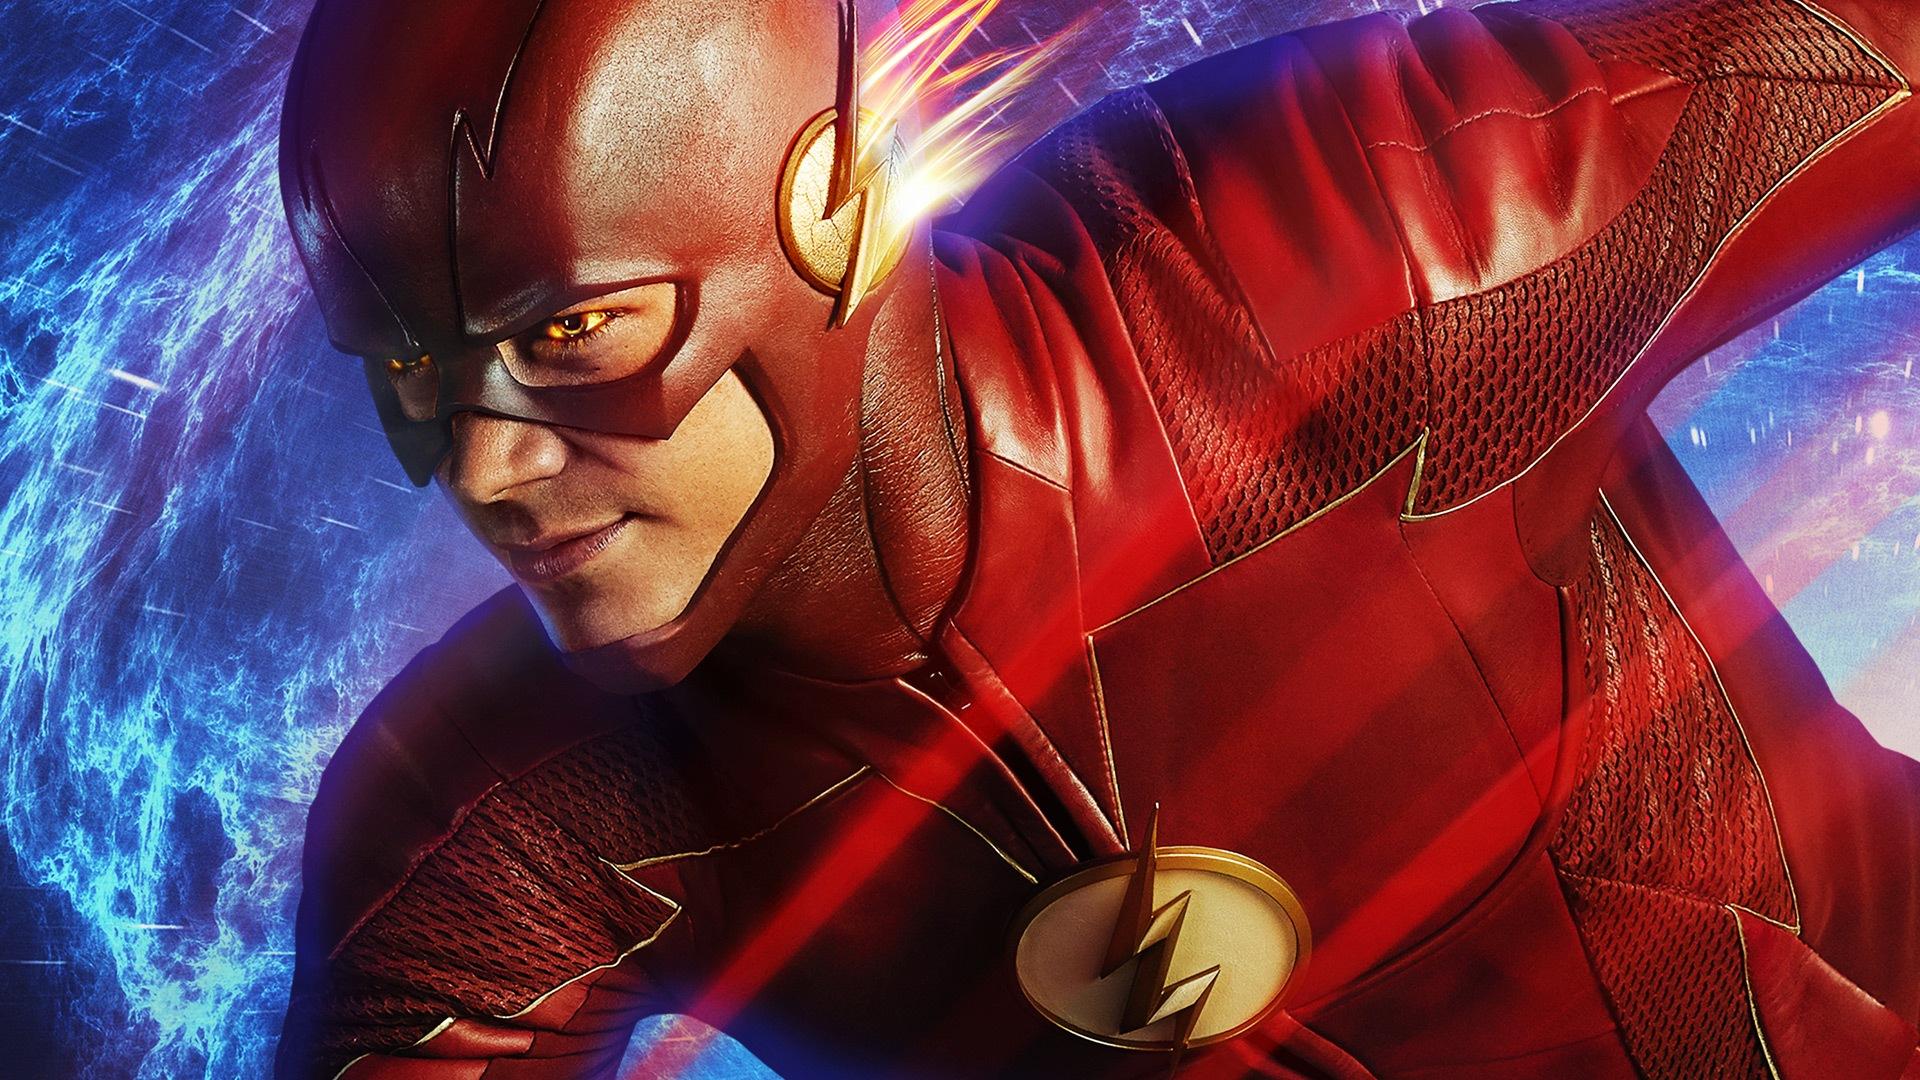 The Flash season 3 episode 19 recap: Its another dumb